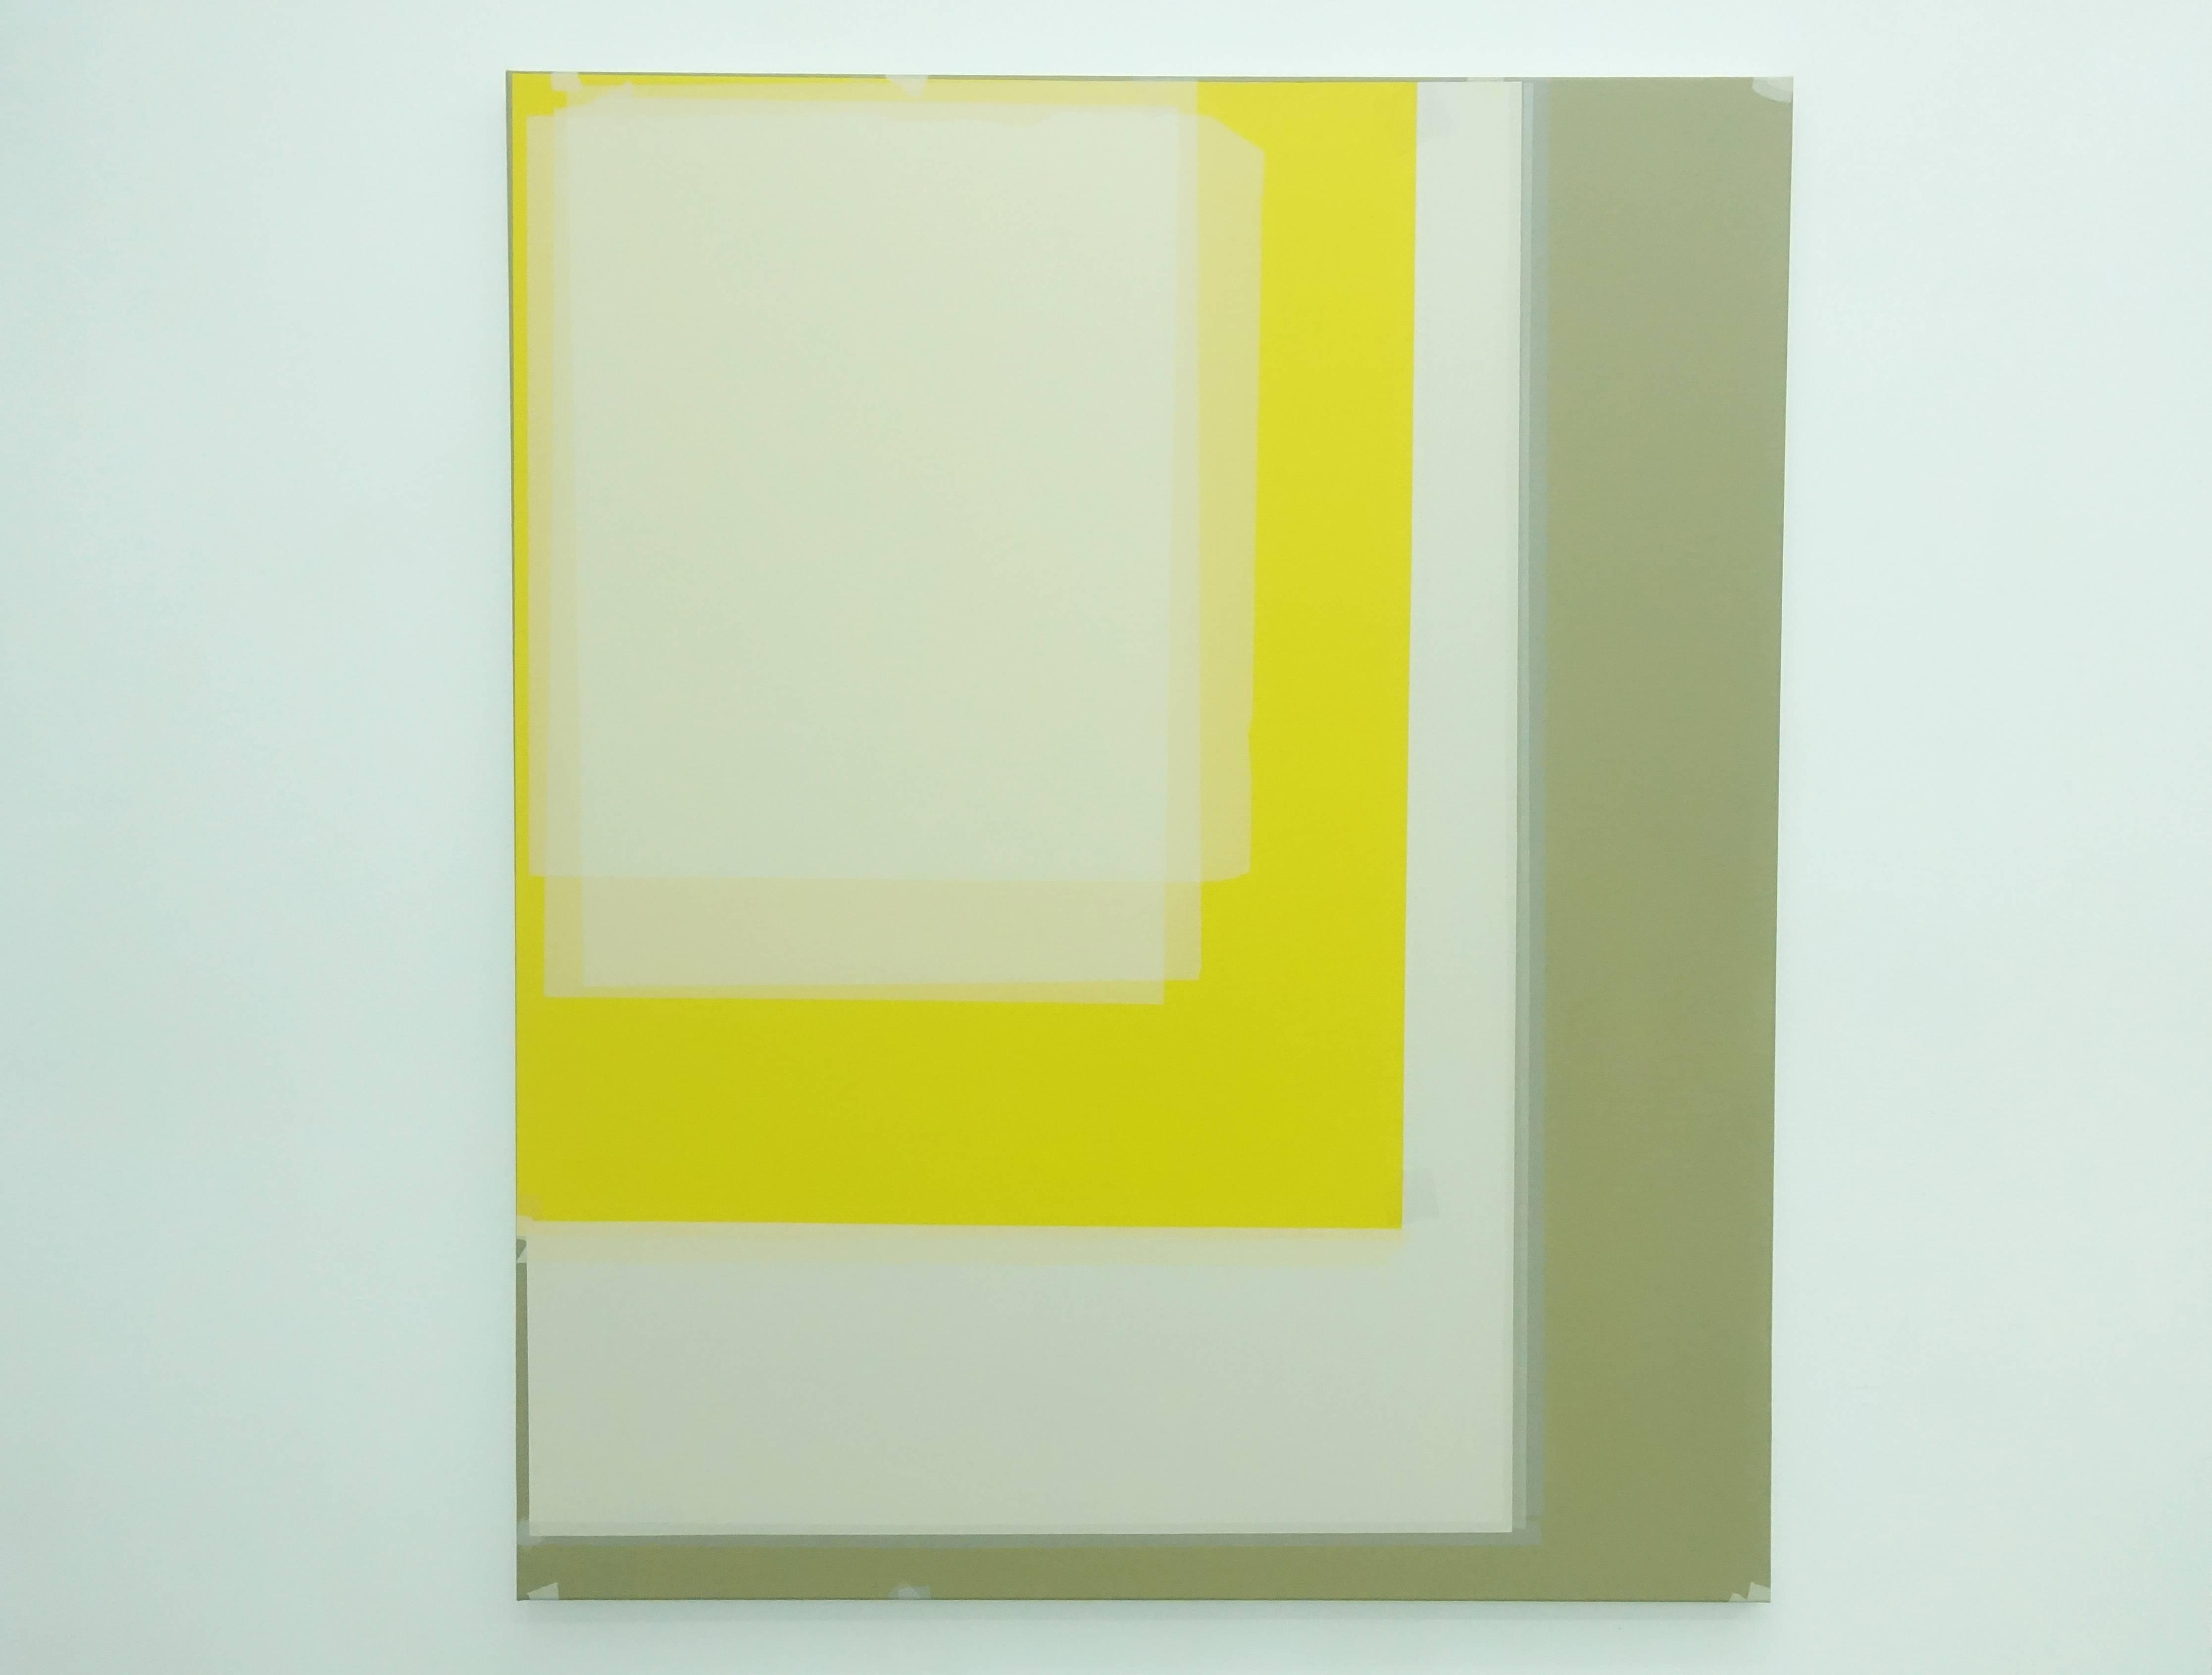 Kees Goudzwaard,《Storage藏》,Oil on canvas,120 x 100 cm,2018。